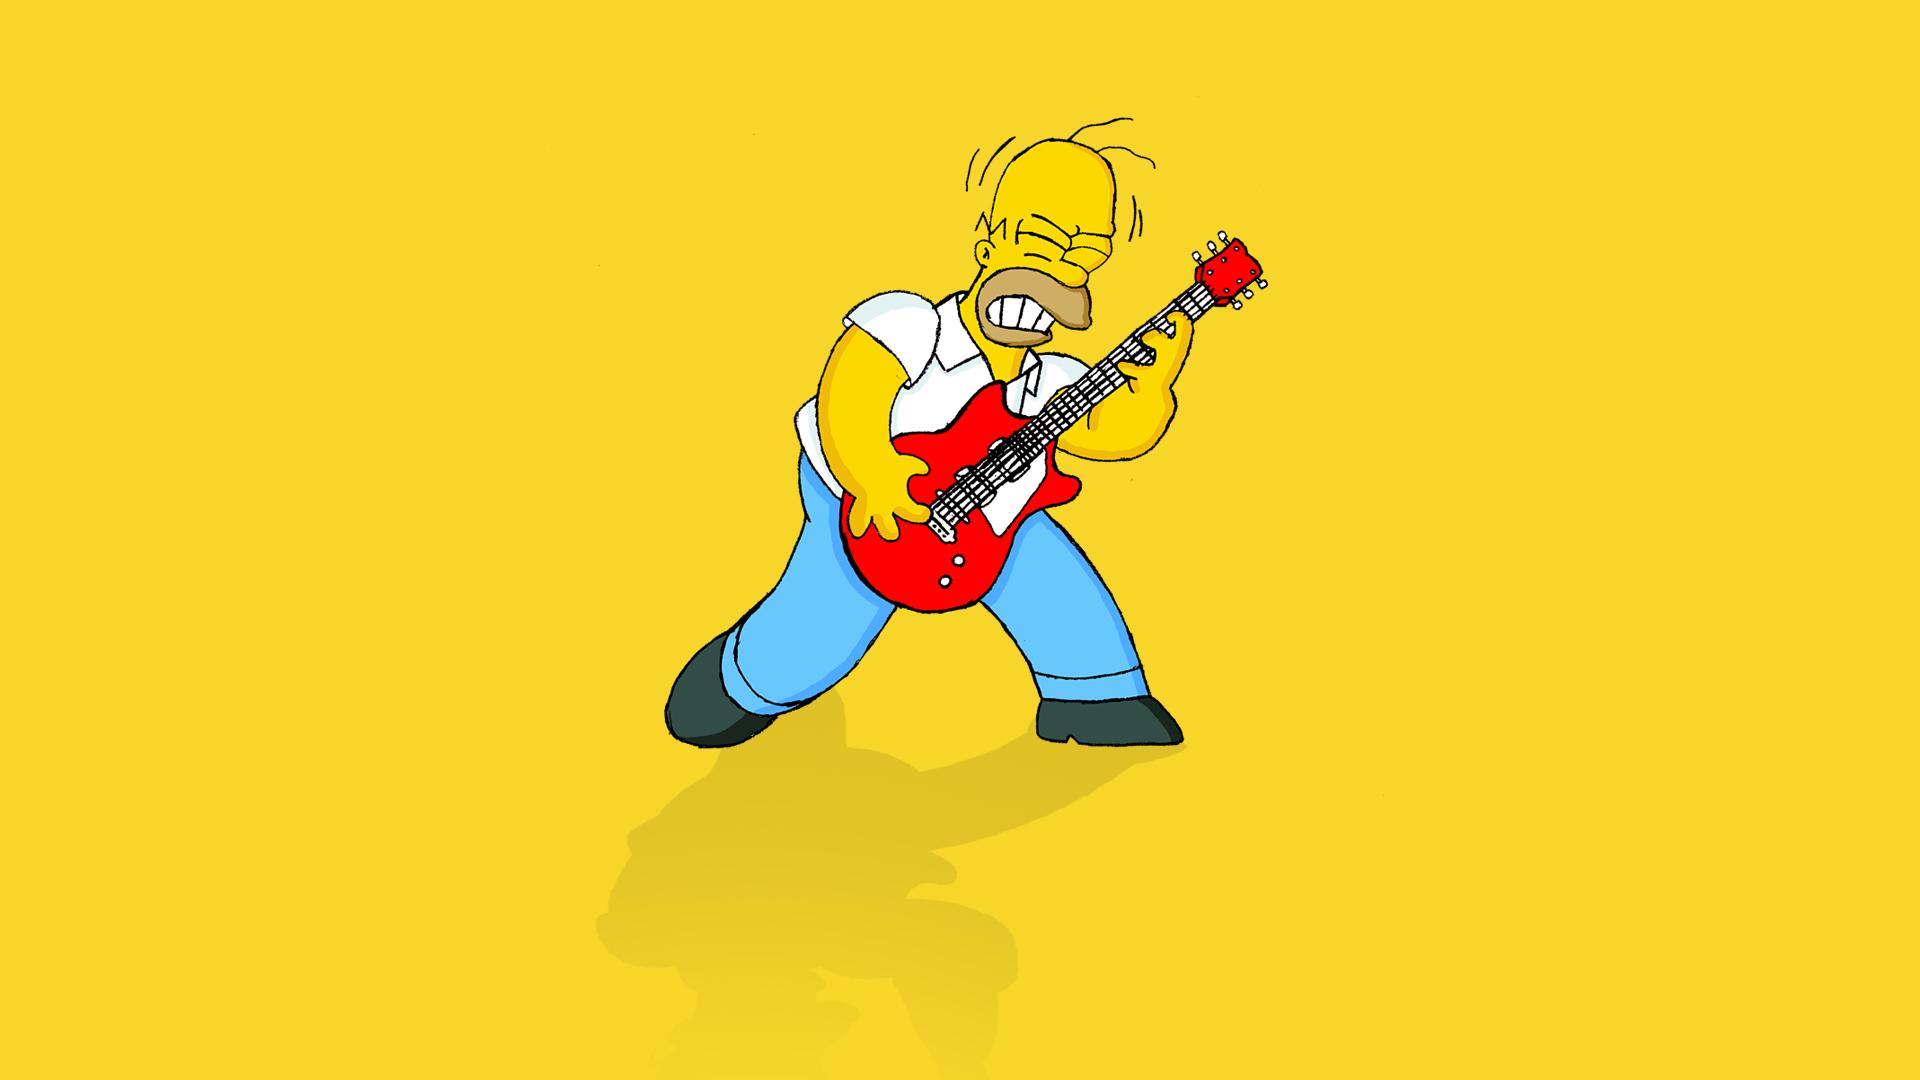 Fotos   Homer Simpson Wallpaper 1920x1080